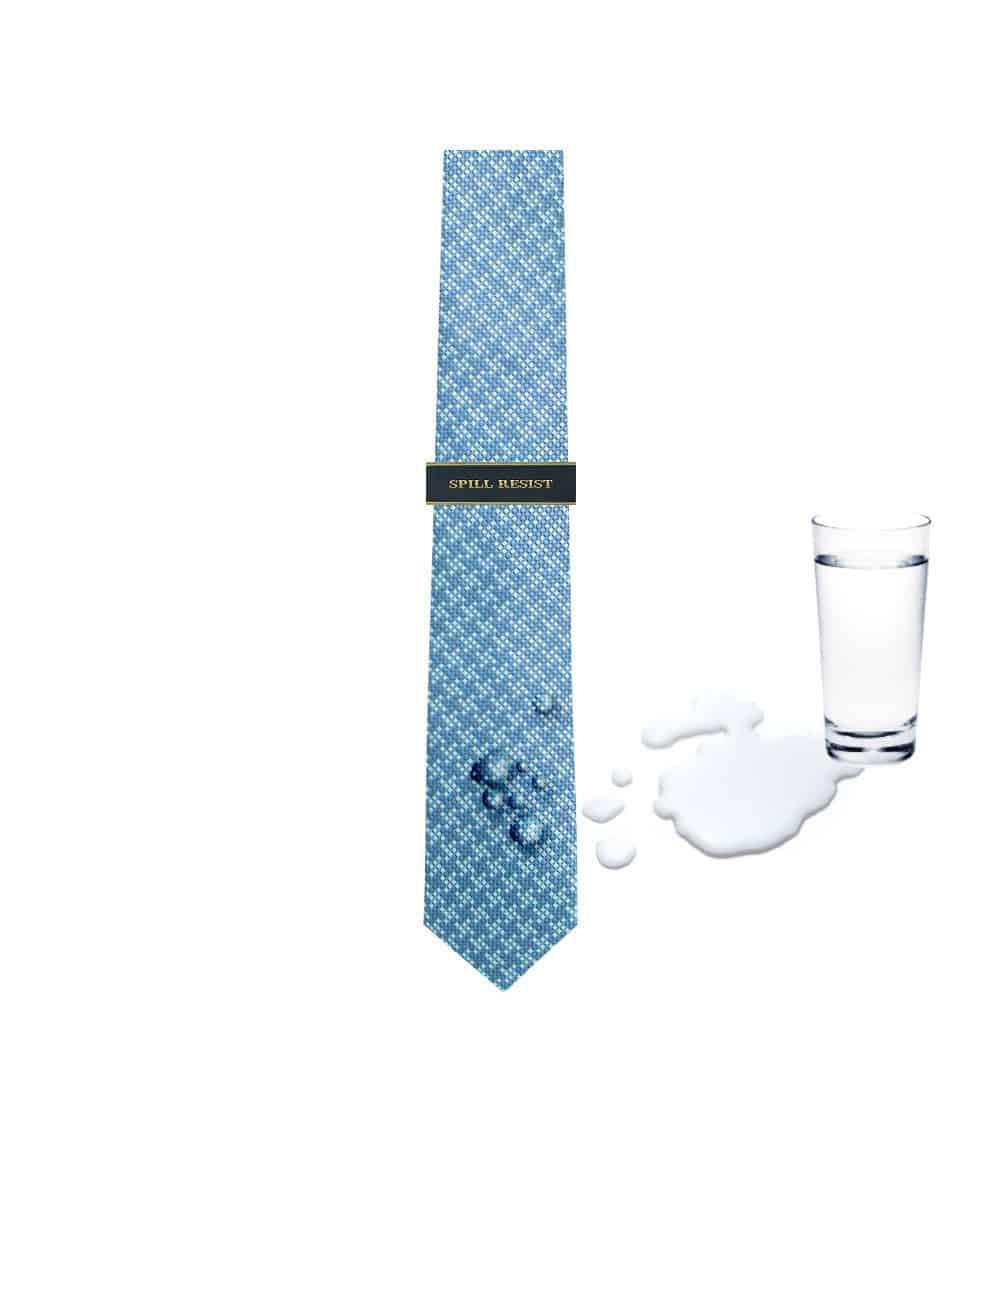 Turquoise Checks Spill Resist Woven Necktie NT44.9